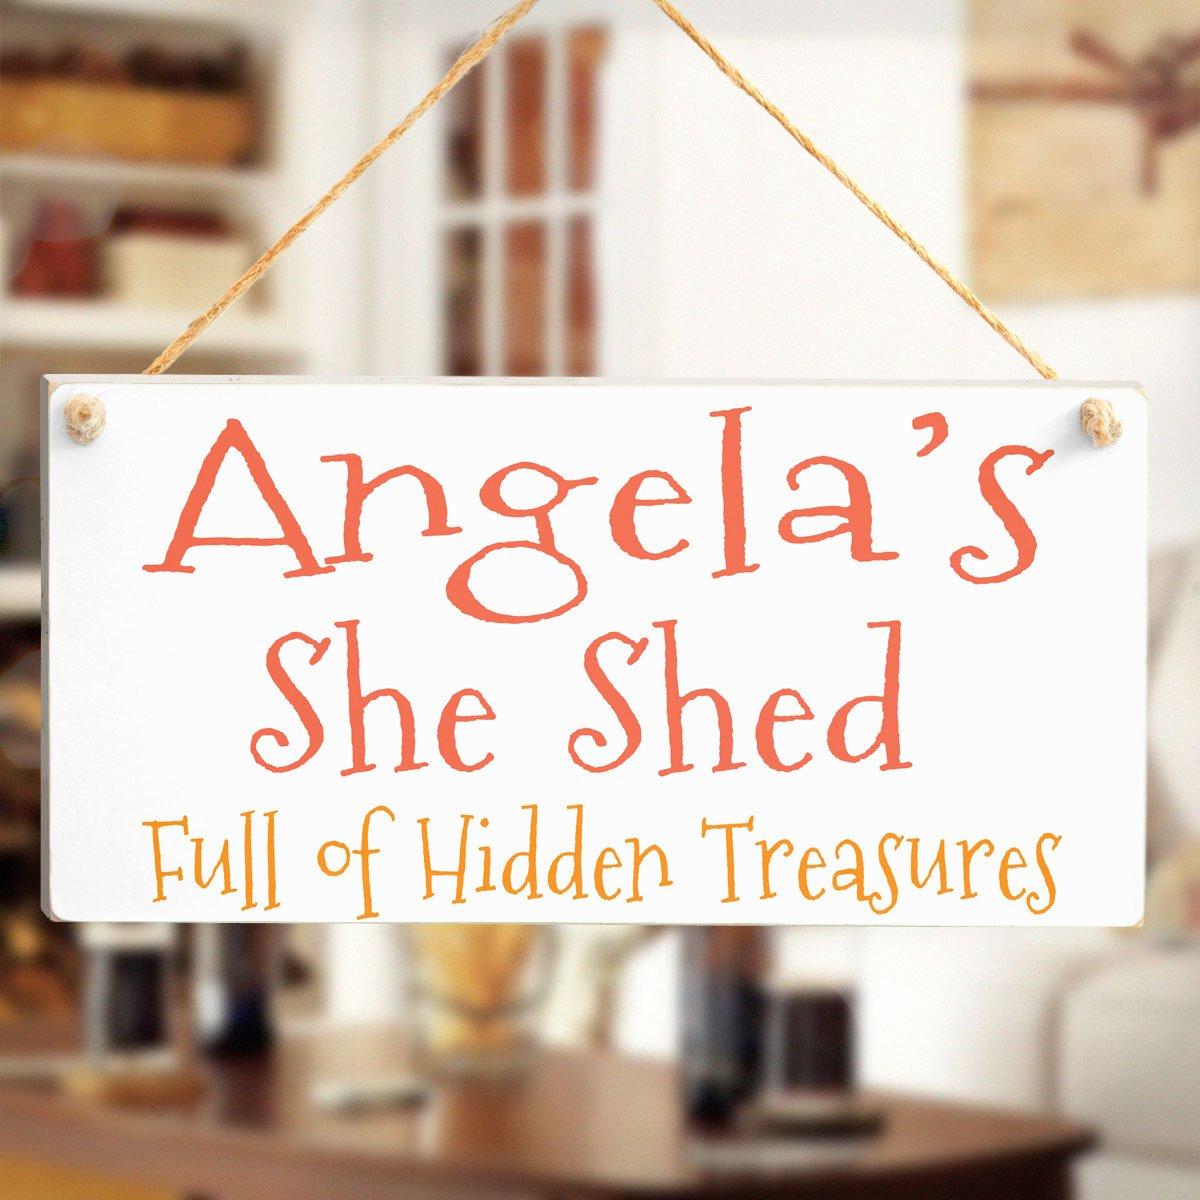 Ella Ella del Cobertizo - Angela cobertizo Full de oculta treasures-personalised cartel de madera regalo: Amazon.es: Hogar